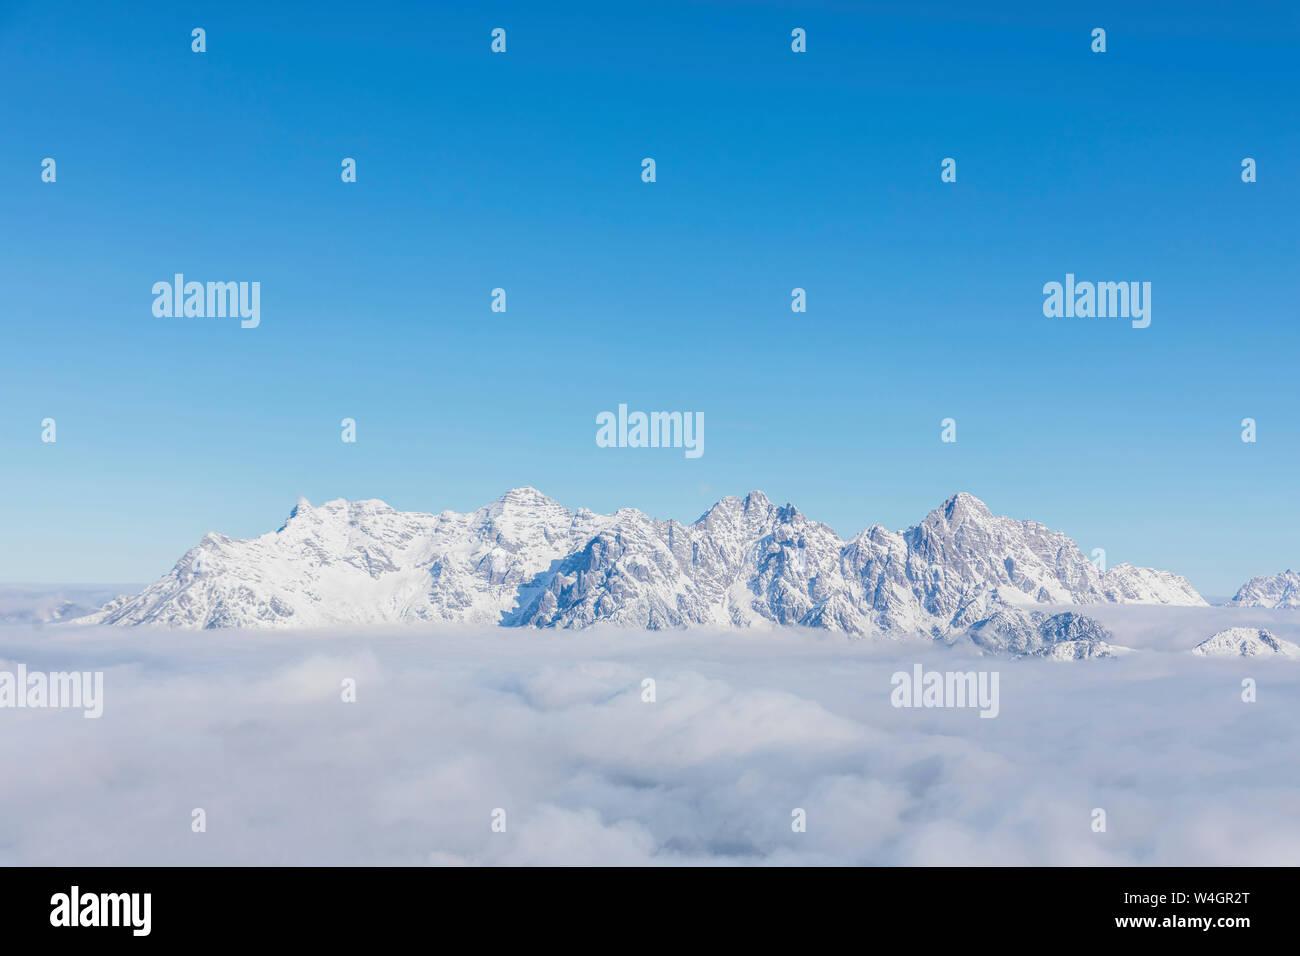 View over snowy mountains at sunshine, Saalbach Hinterglemm, Pinzgau, Austria Stock Photo